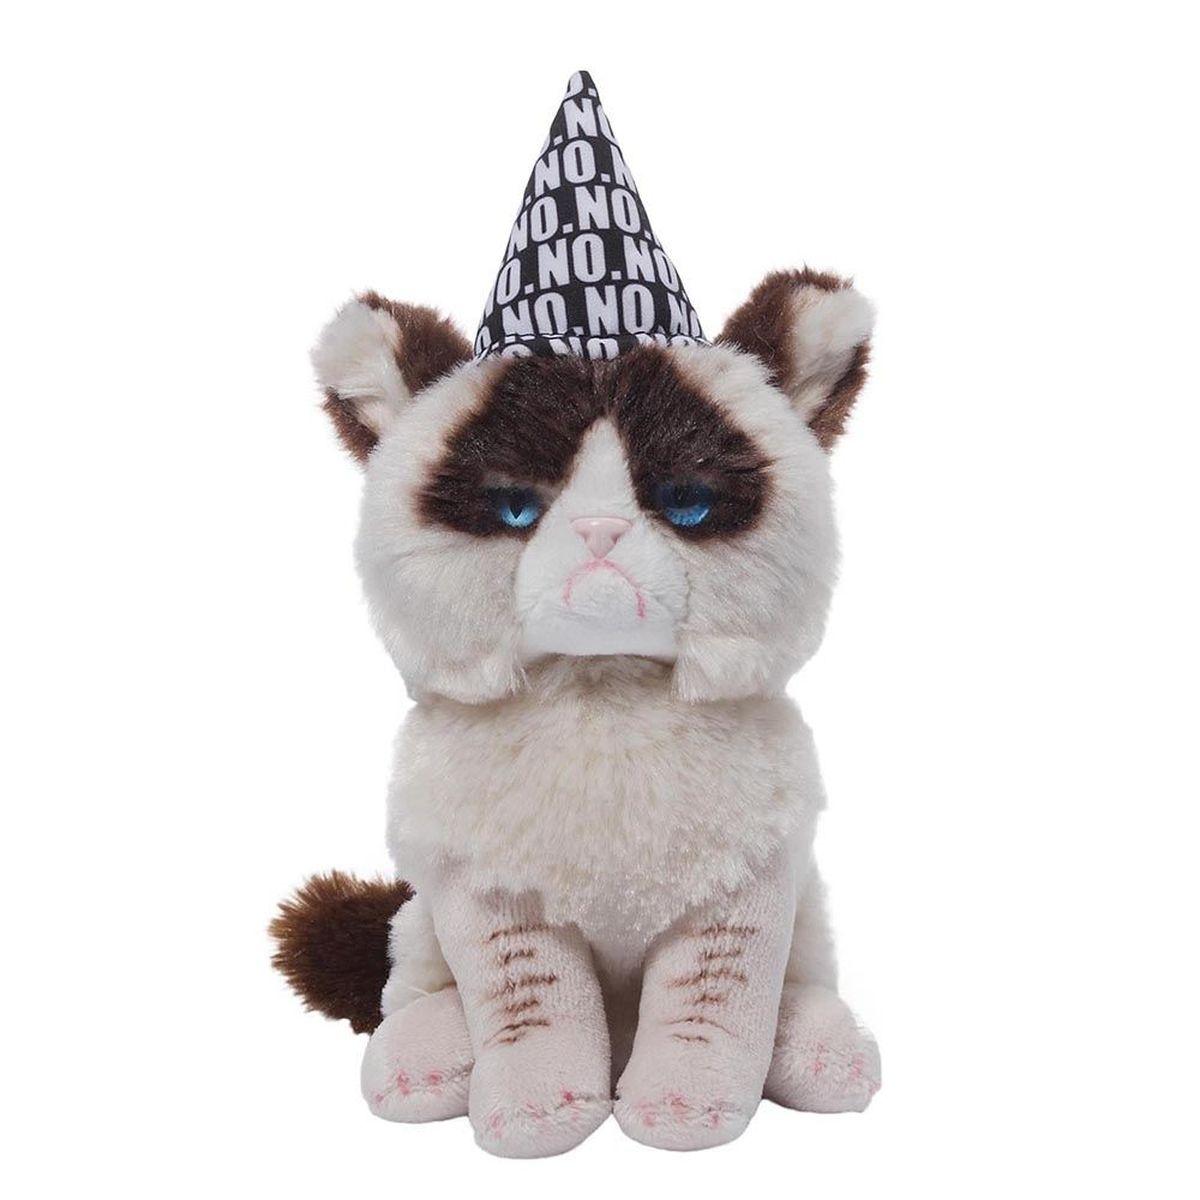 Gund Мягкая игрушка Grumpy Cat Birthday Beanbag 12,5 см gund мягкая игрушка grumpy cat 23 см